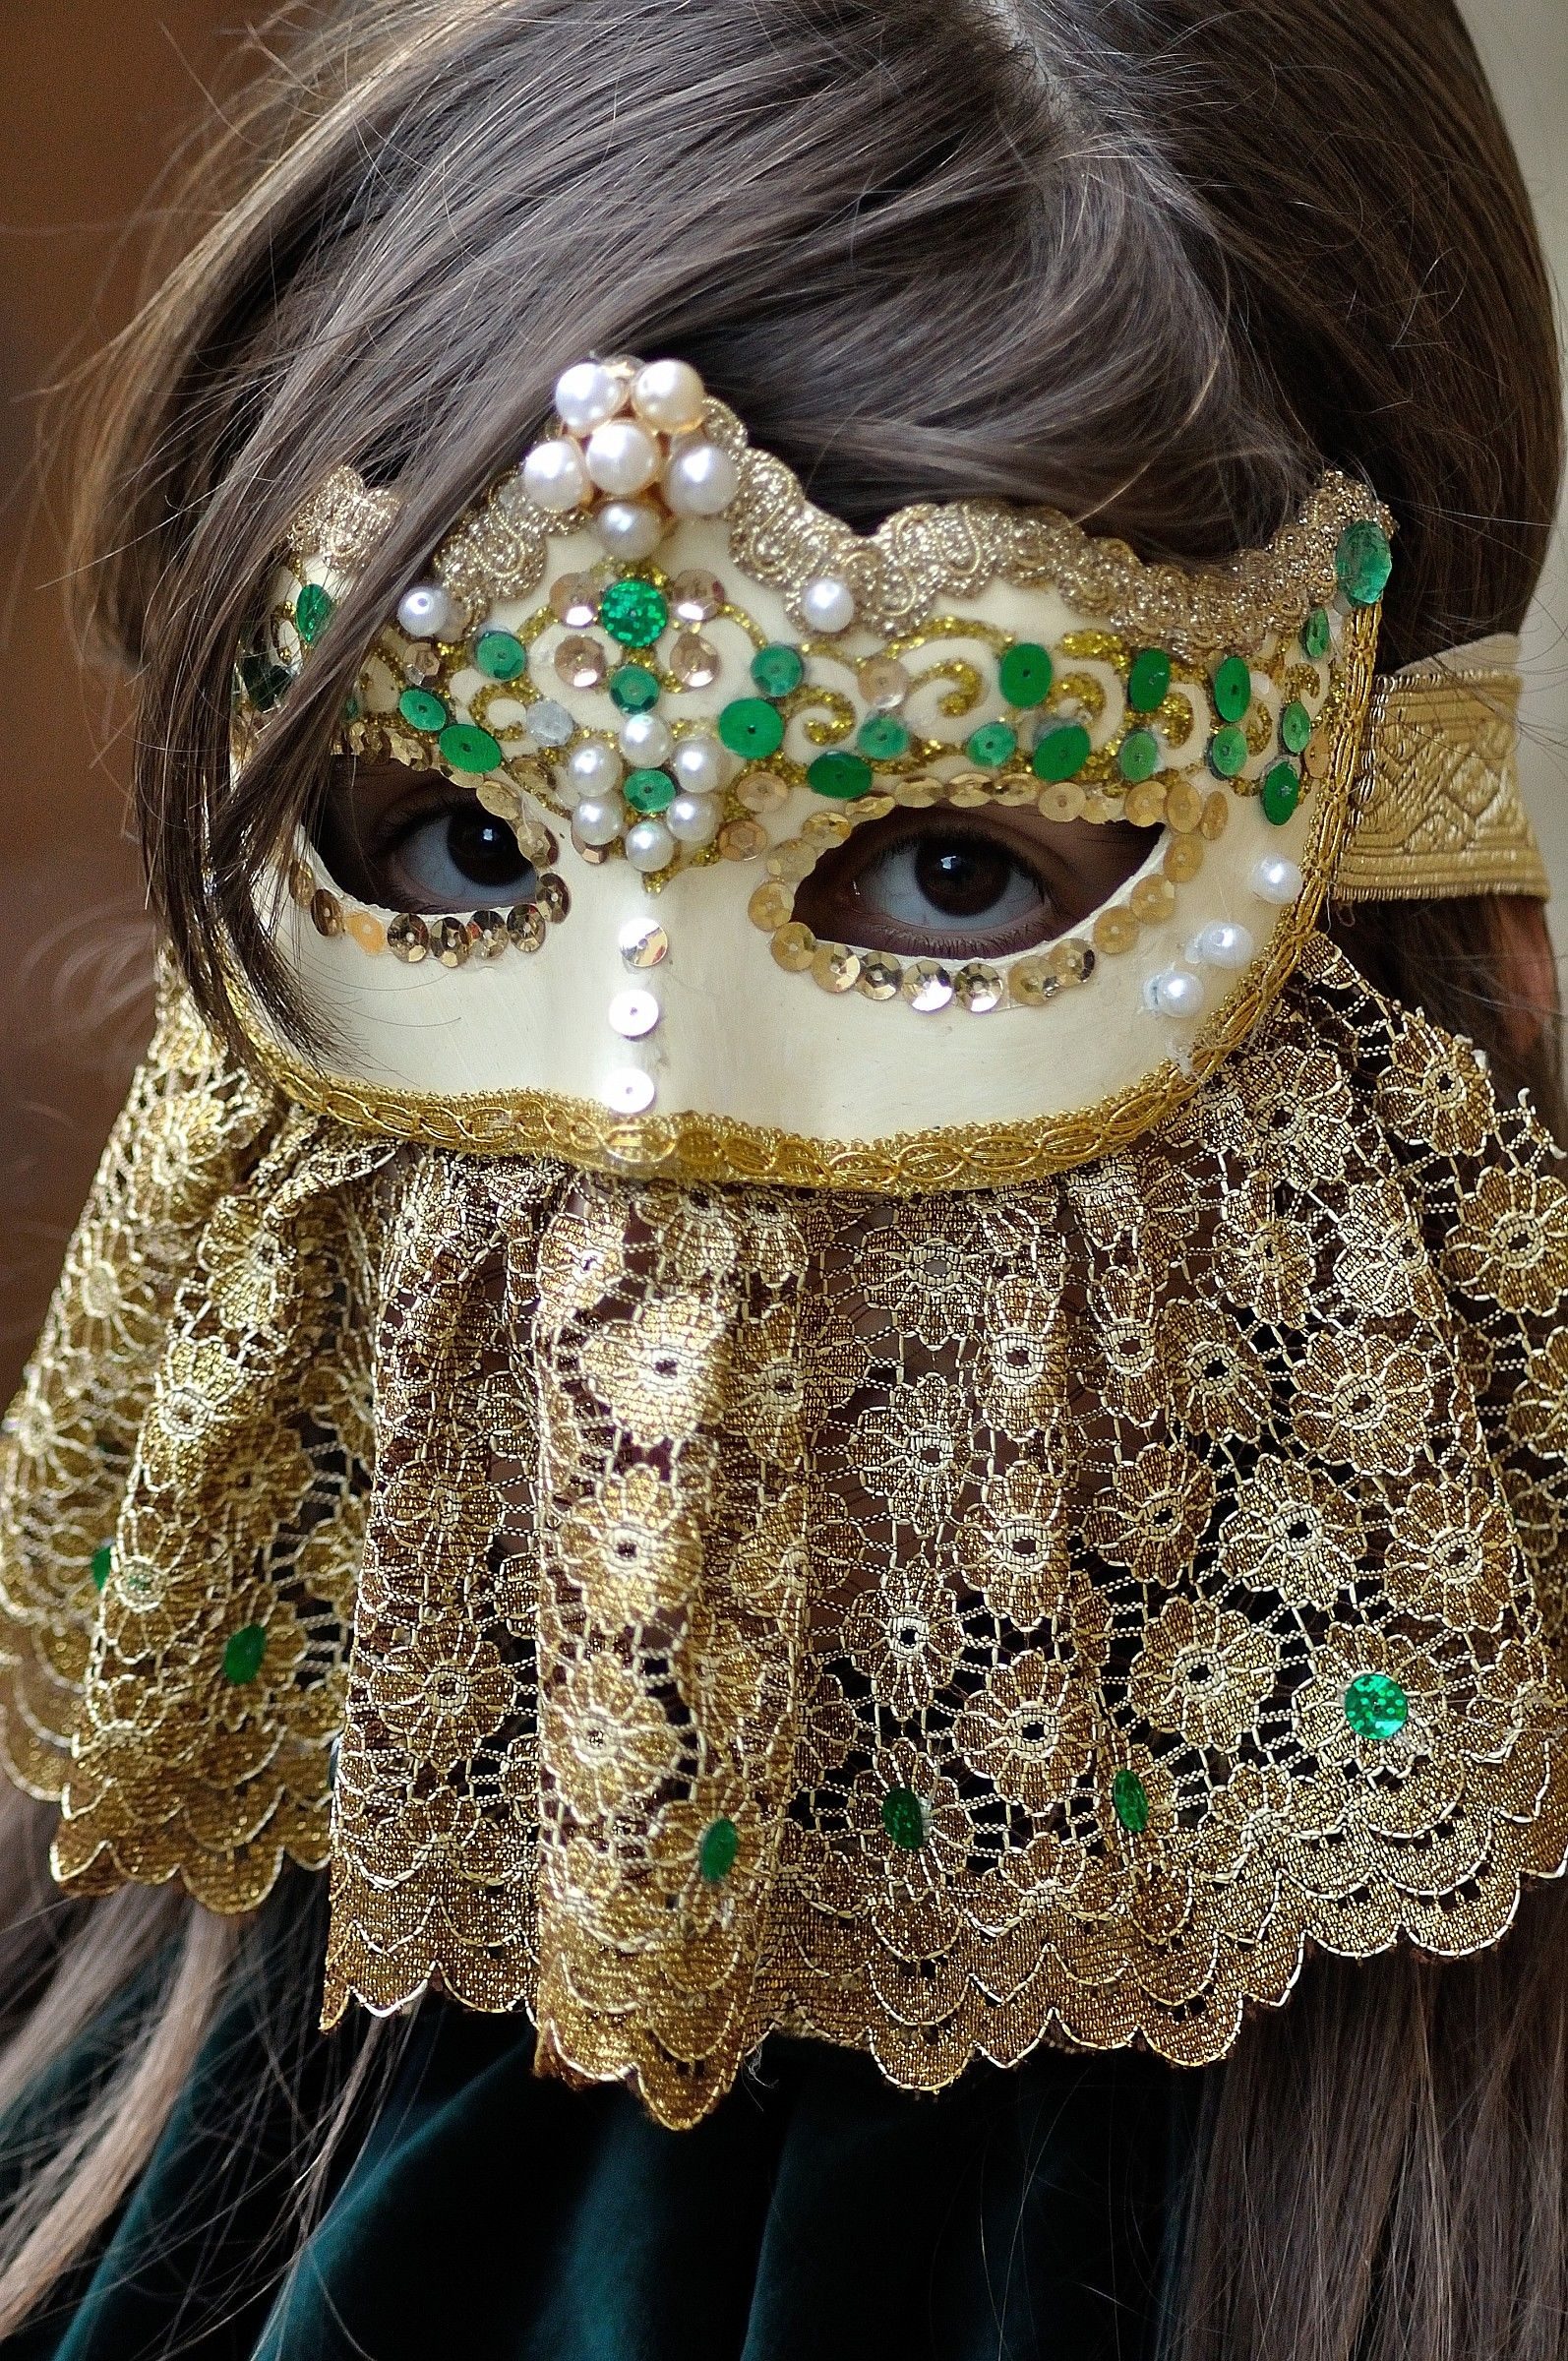 Future princess...